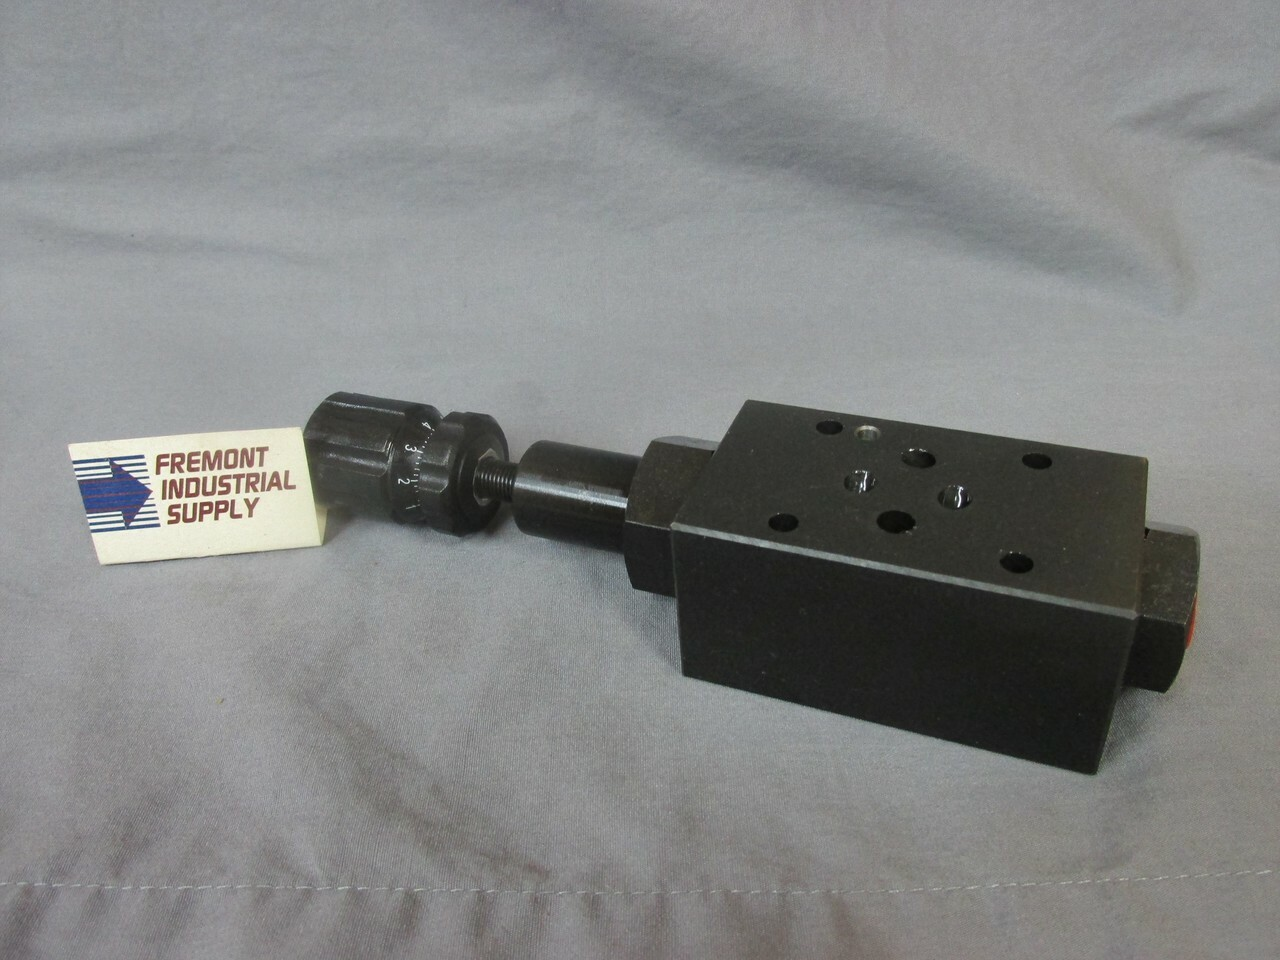 (Qty of 1) D05 Modular hydraulic counterbalance valve port B 1000-3000 adjustment range  Power Valve USA